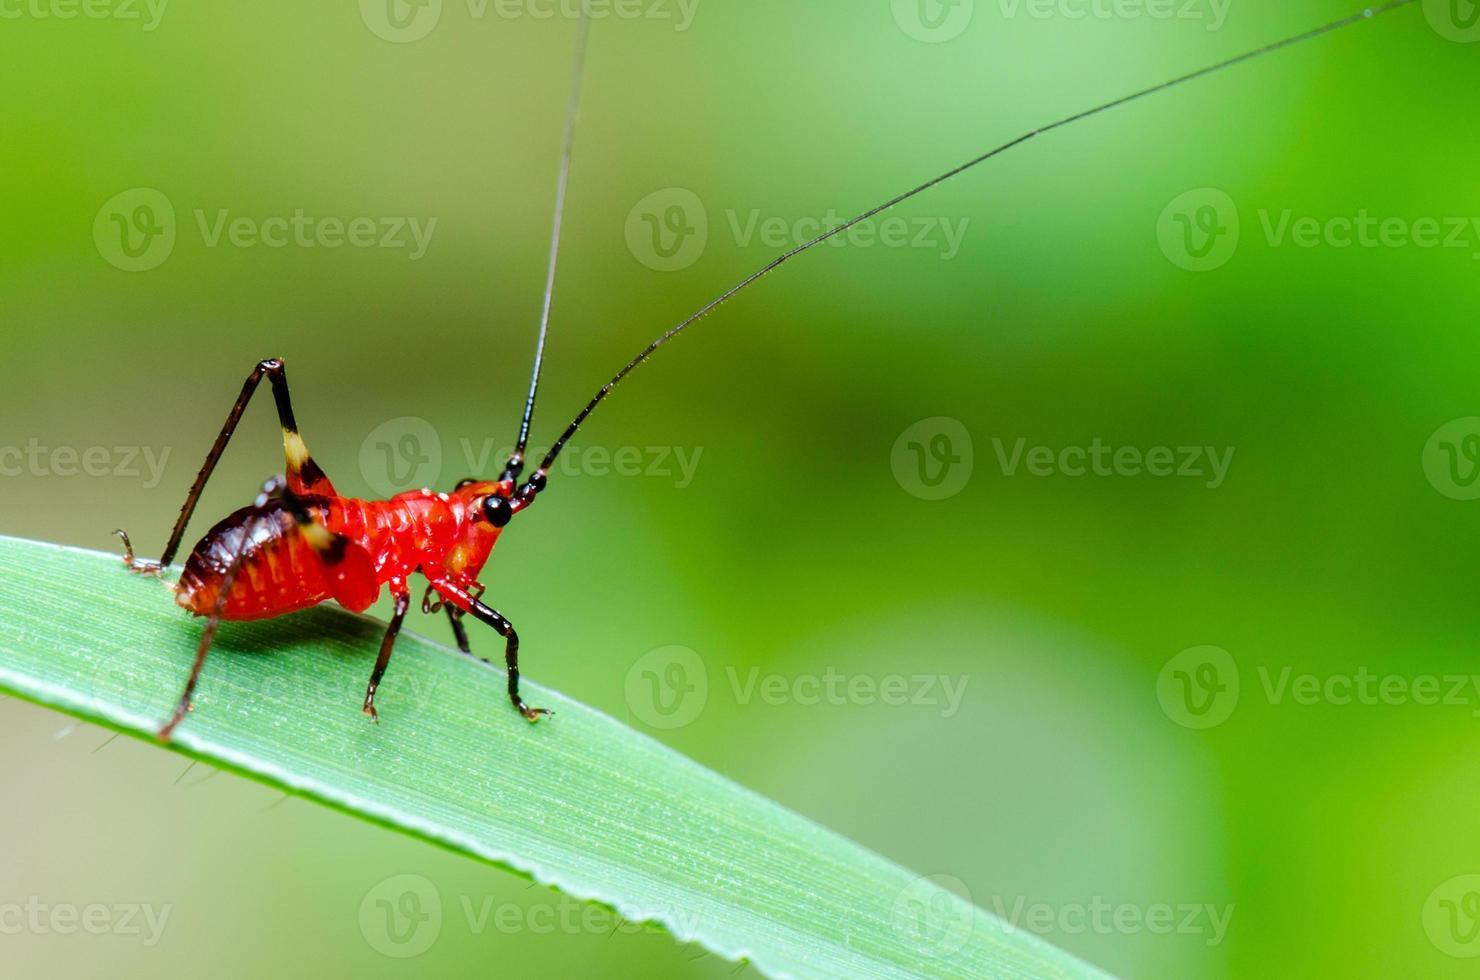 conocephalus melas kleine rode krekel foto